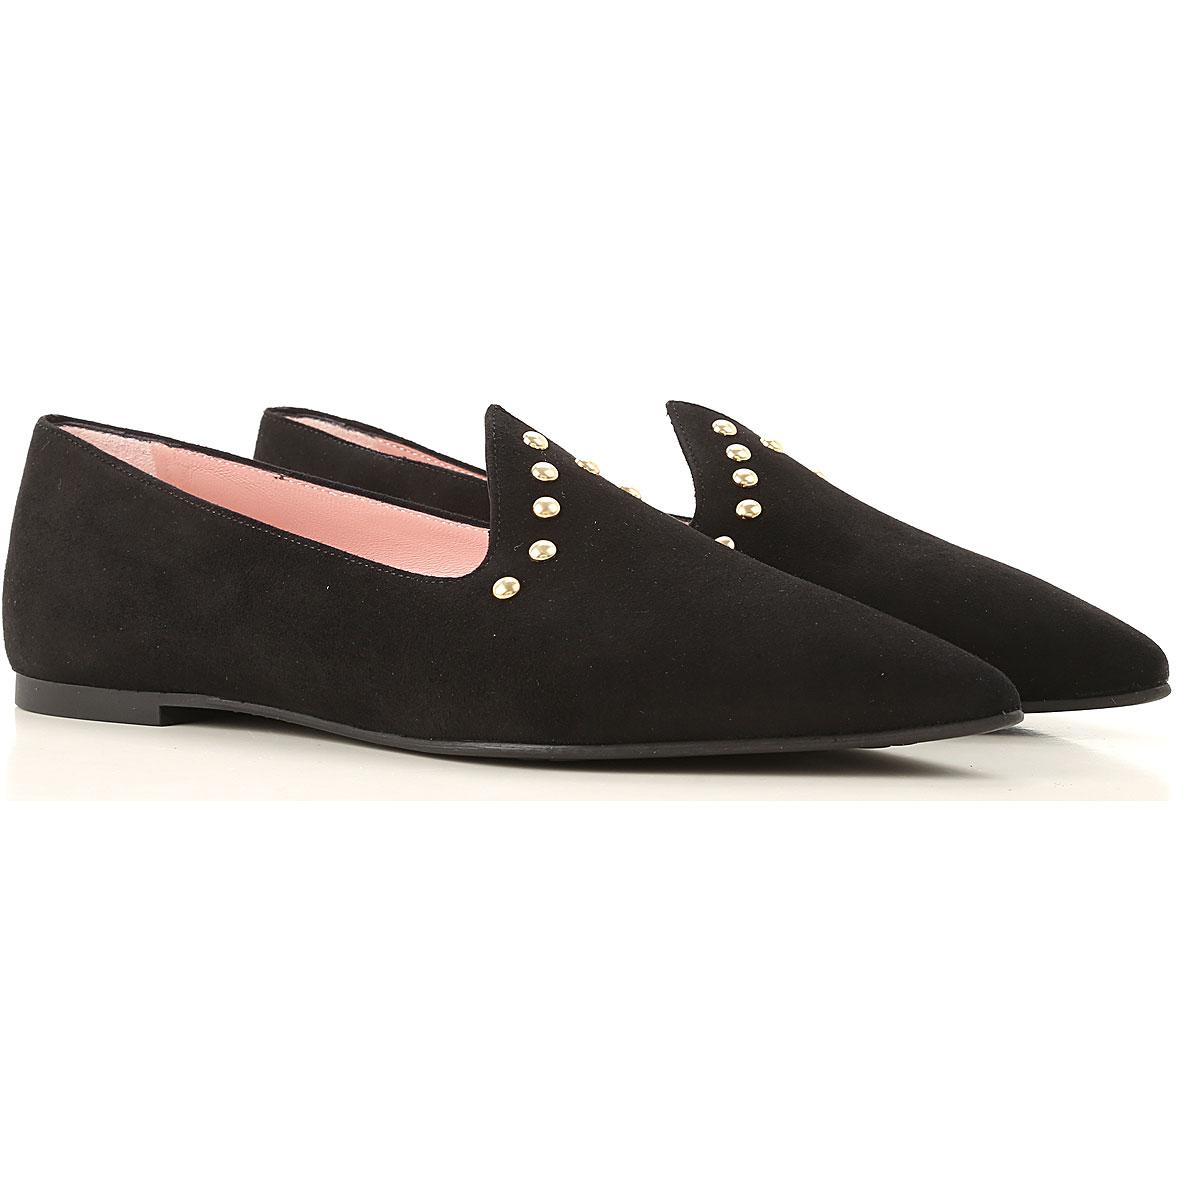 Pretty Ballerinas Ballet Flats Ballerina Shoes for Women On Sale, Black, Leather, 2019, 10 6 8 9